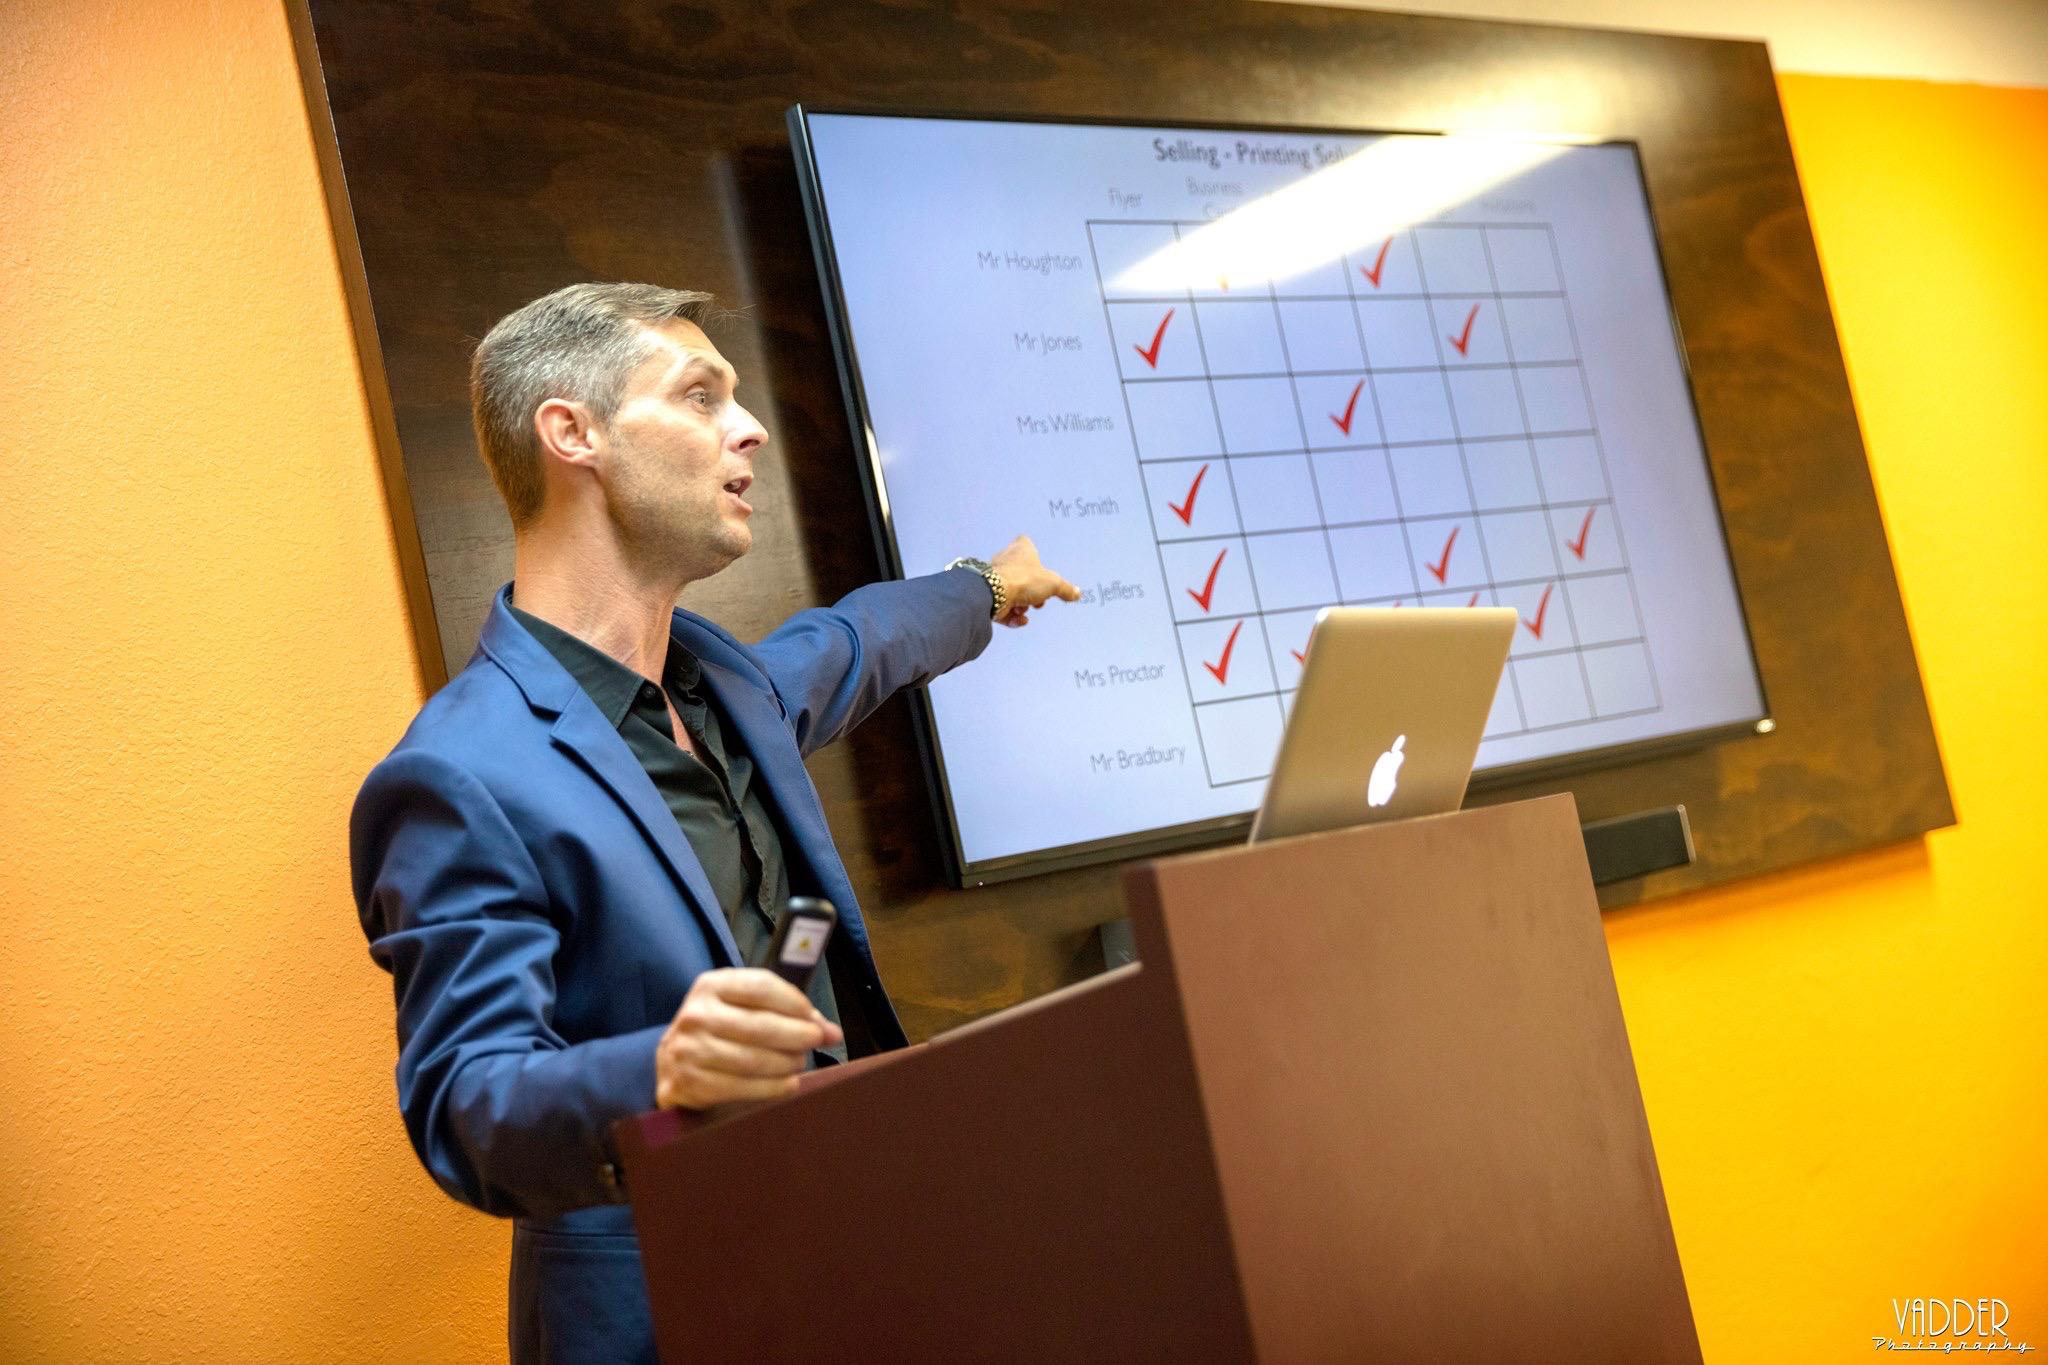 JFDI GLOBAL, Internatinoal Speaker